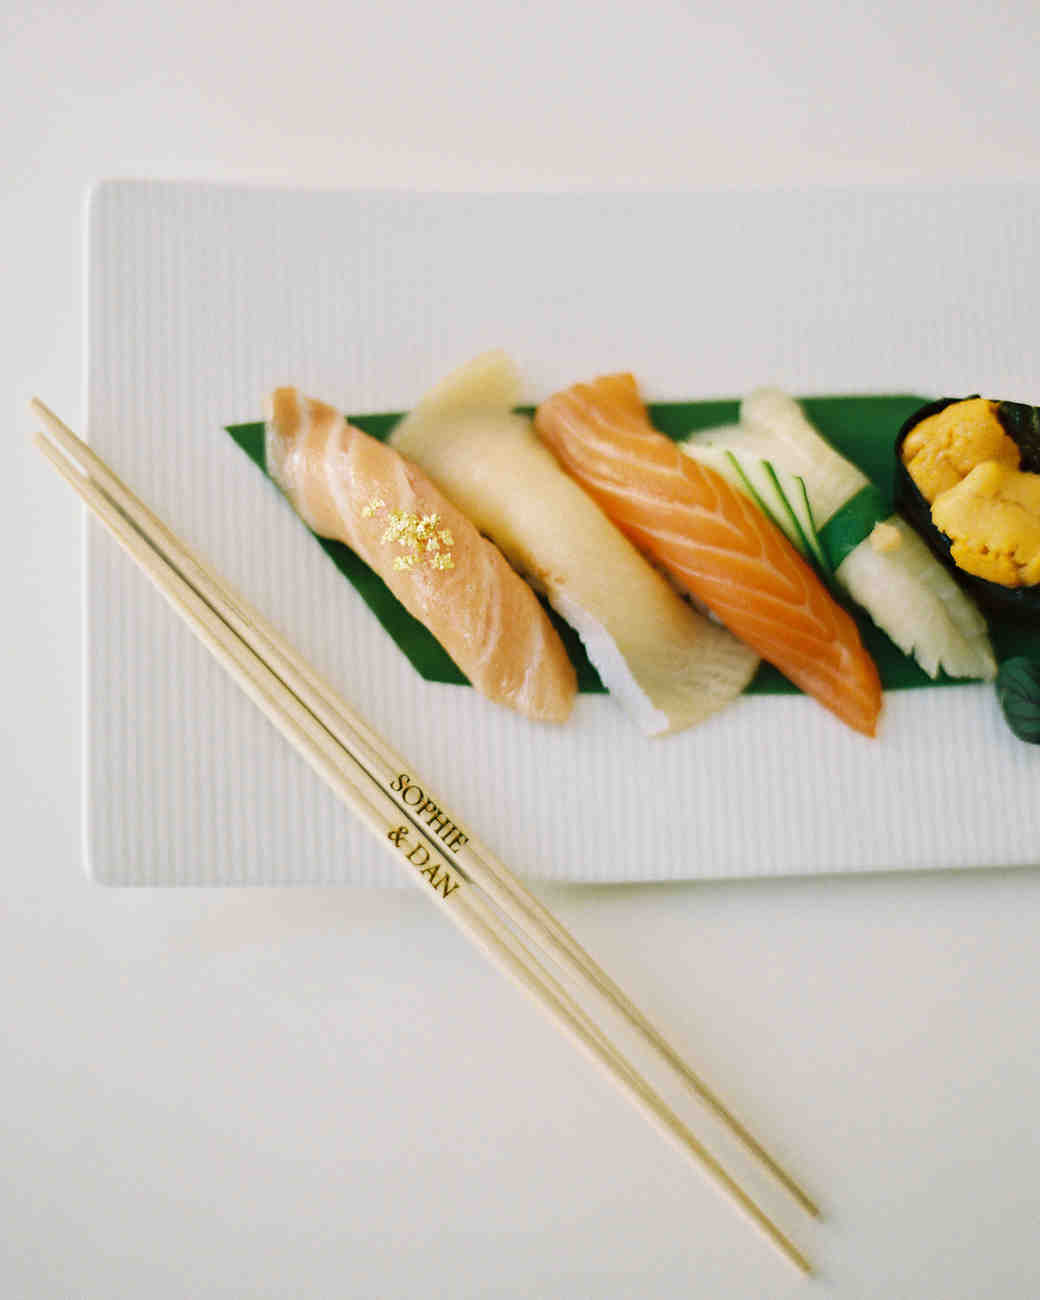 sophie-dan-sushi-003315-r1-013-wd109864.jpg